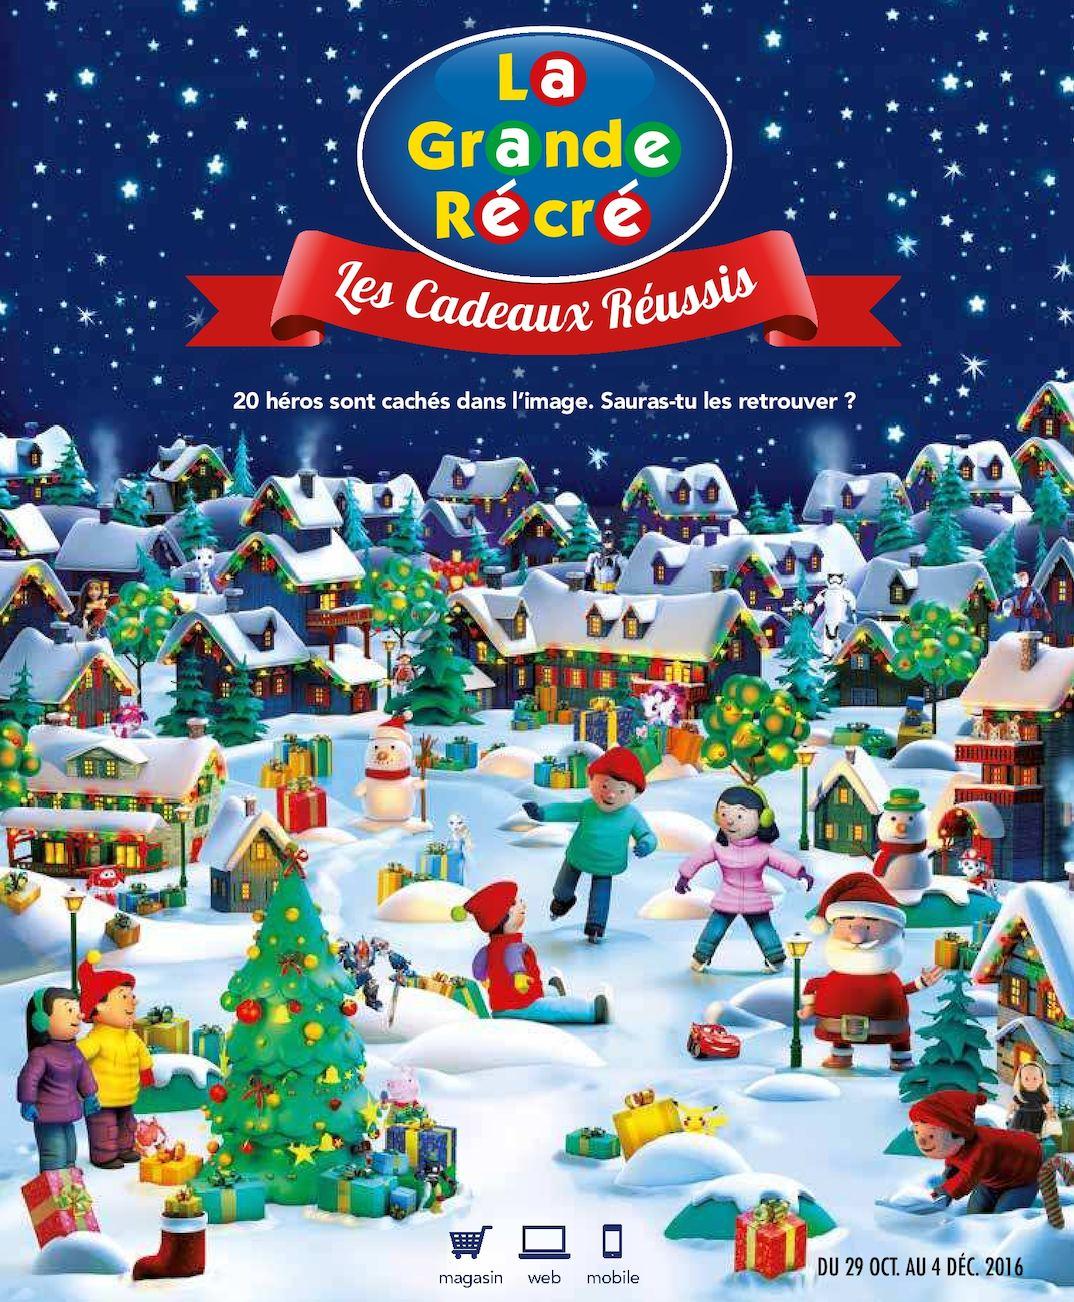 Calaméo LA GRANDE RECRE GUYANE CATALOGUE NOEL - Lit cabane la grande recre